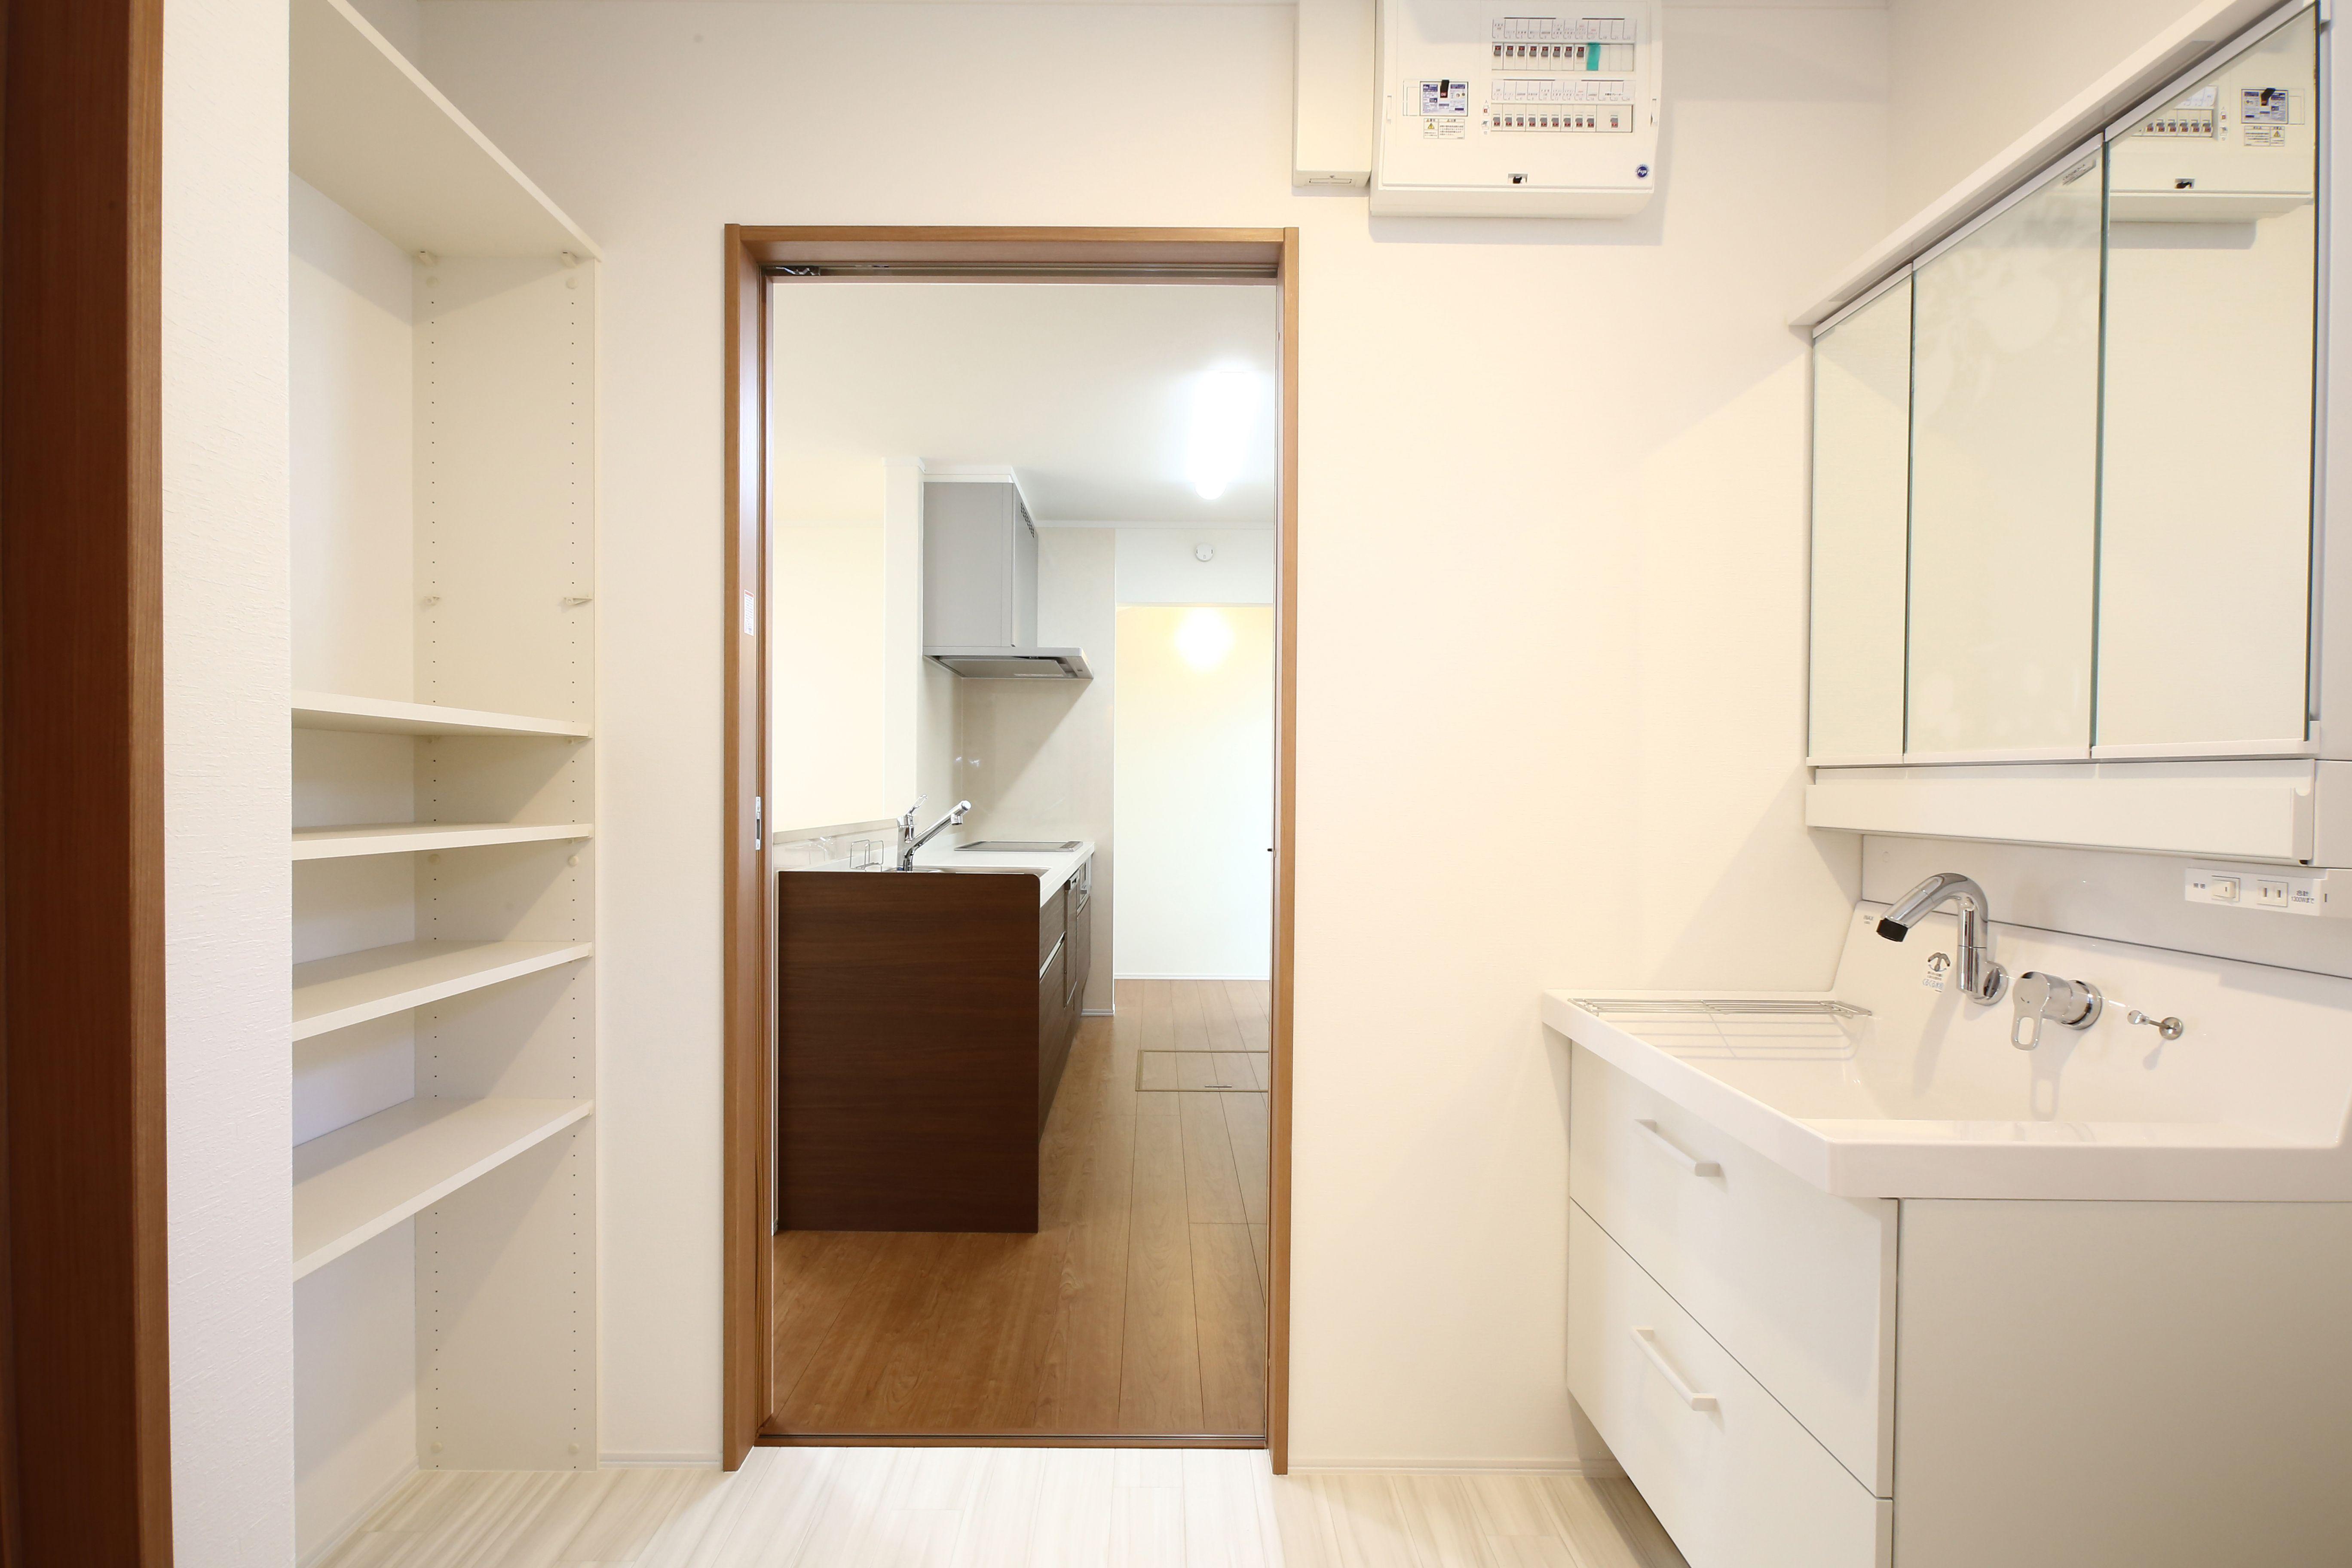 建築実例 洗面所 洗面台 Lixil ウォークスルー 家事動線 洗濯 可動棚